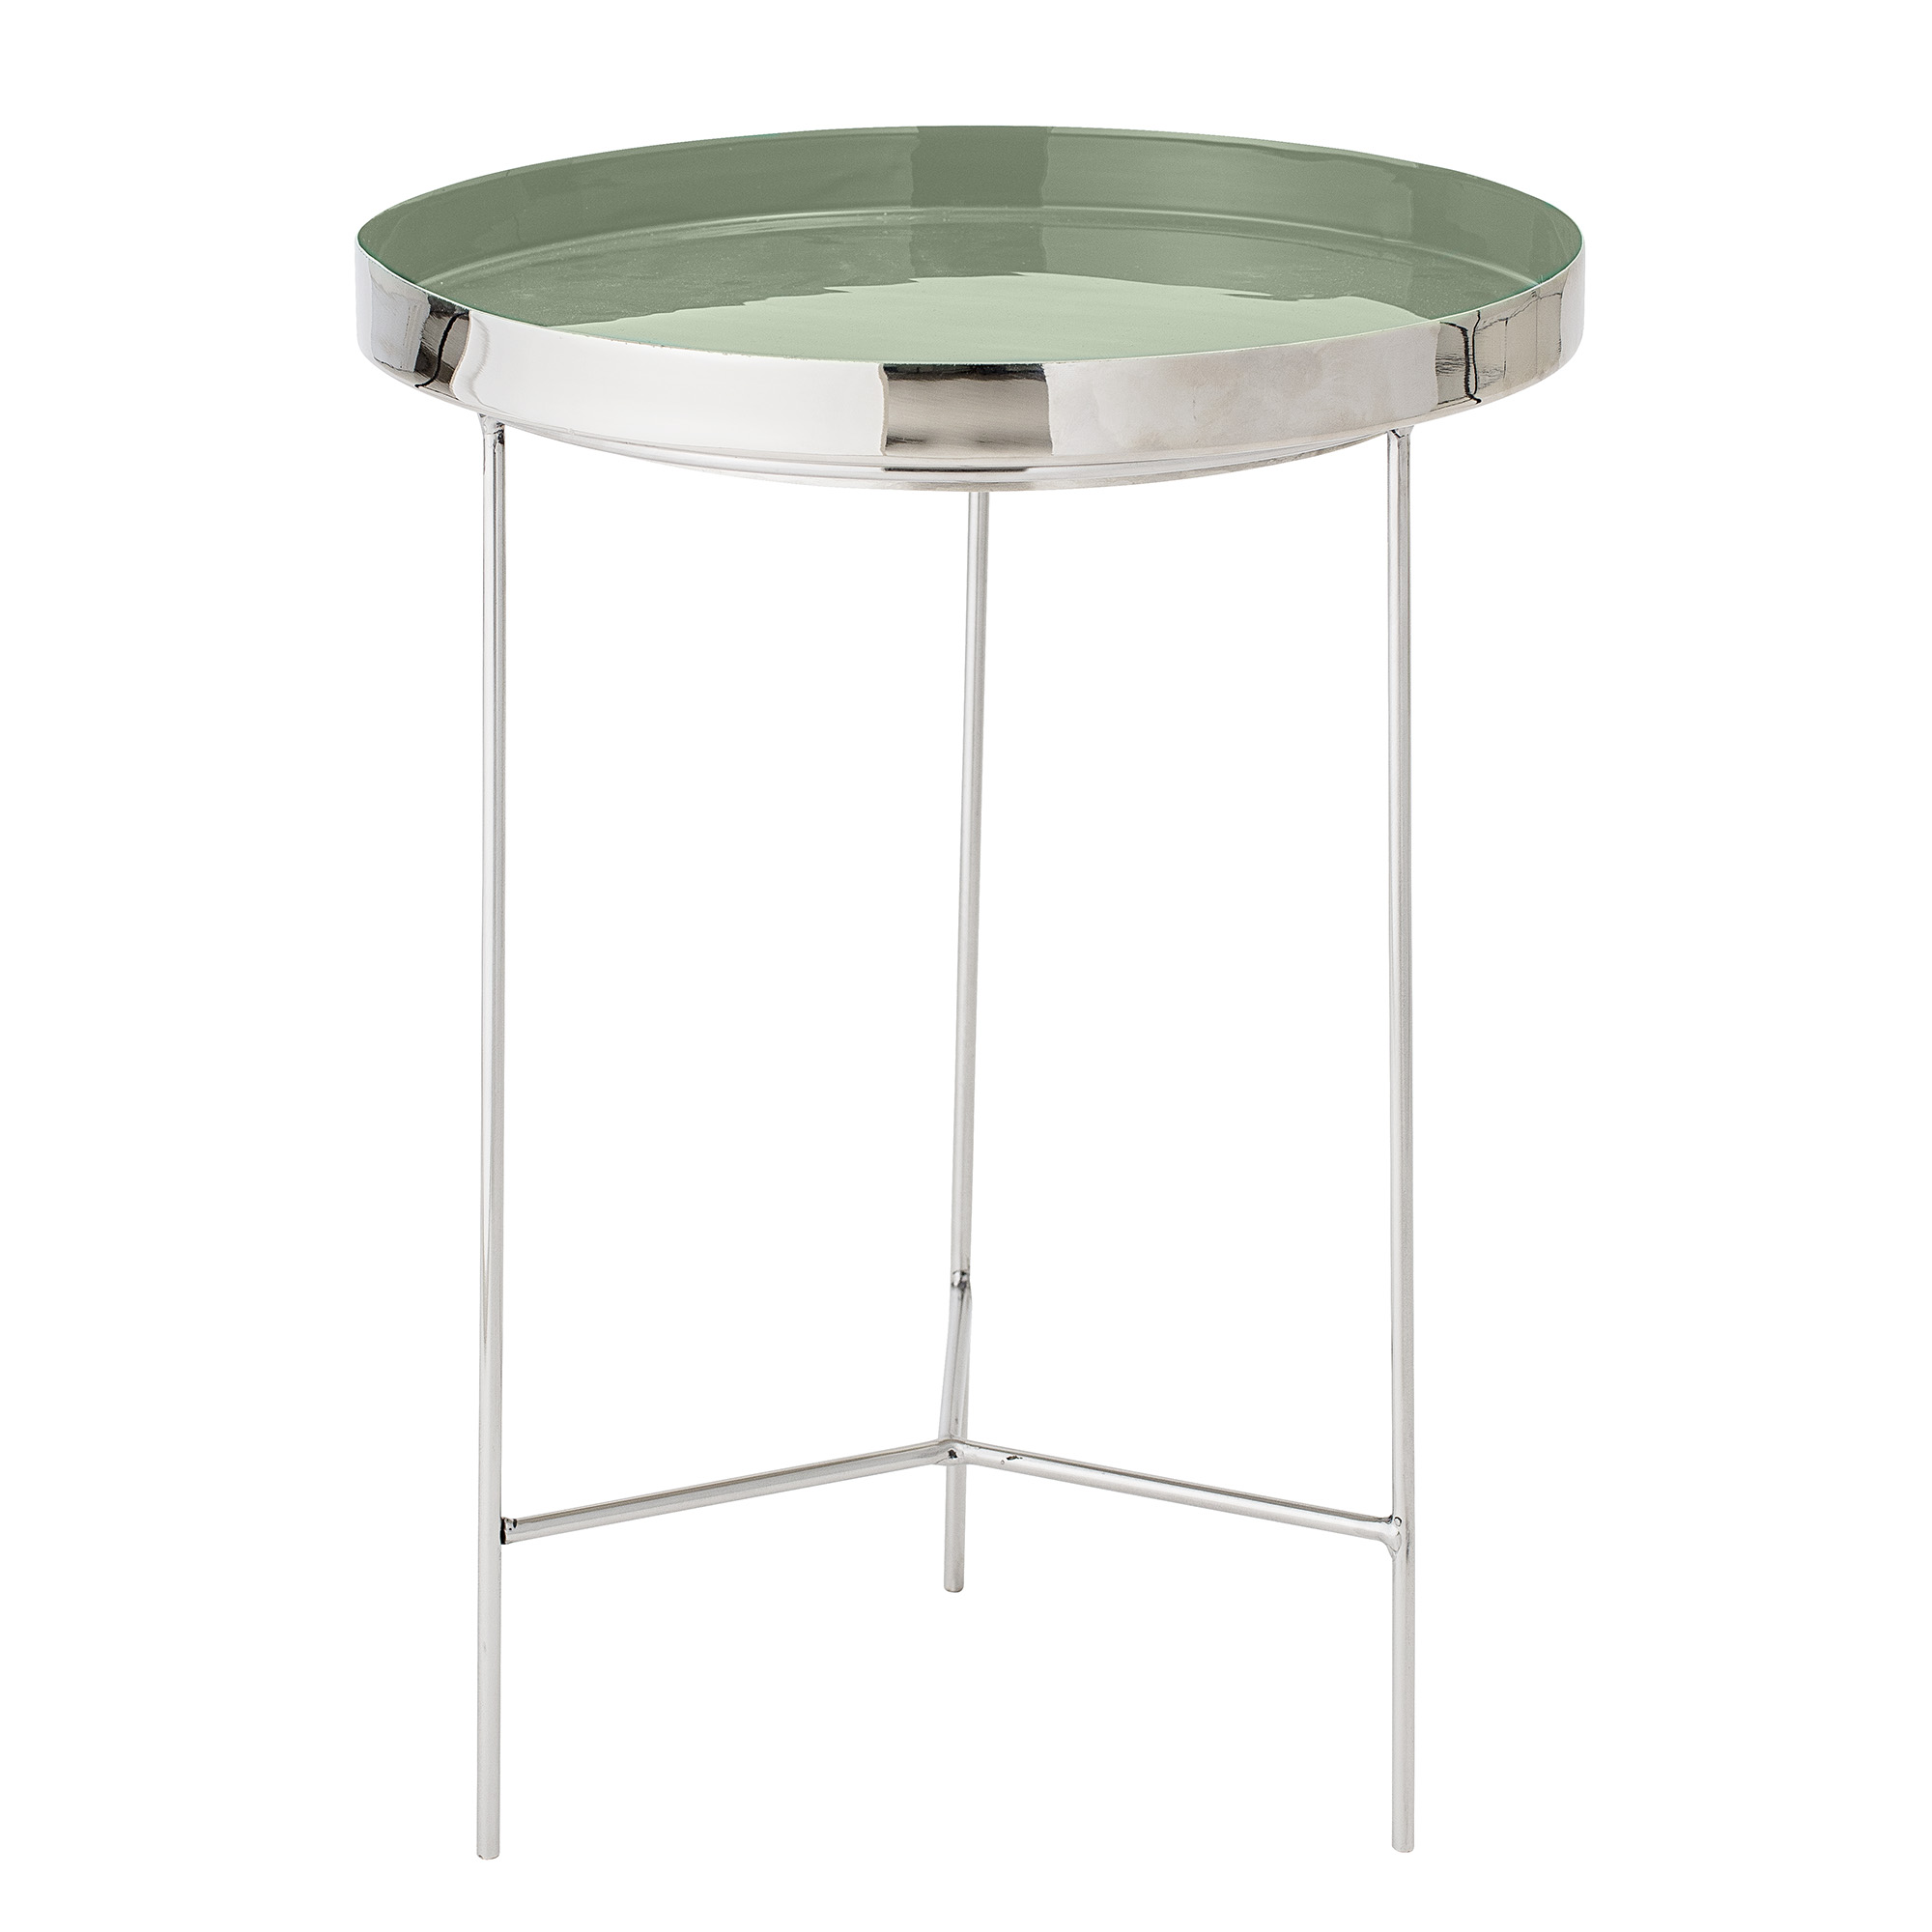 Bloomingville sola bakkebord - grøn/sølv aluminium/stål, rund (ø40) fra bloomingville fra boboonline.dk